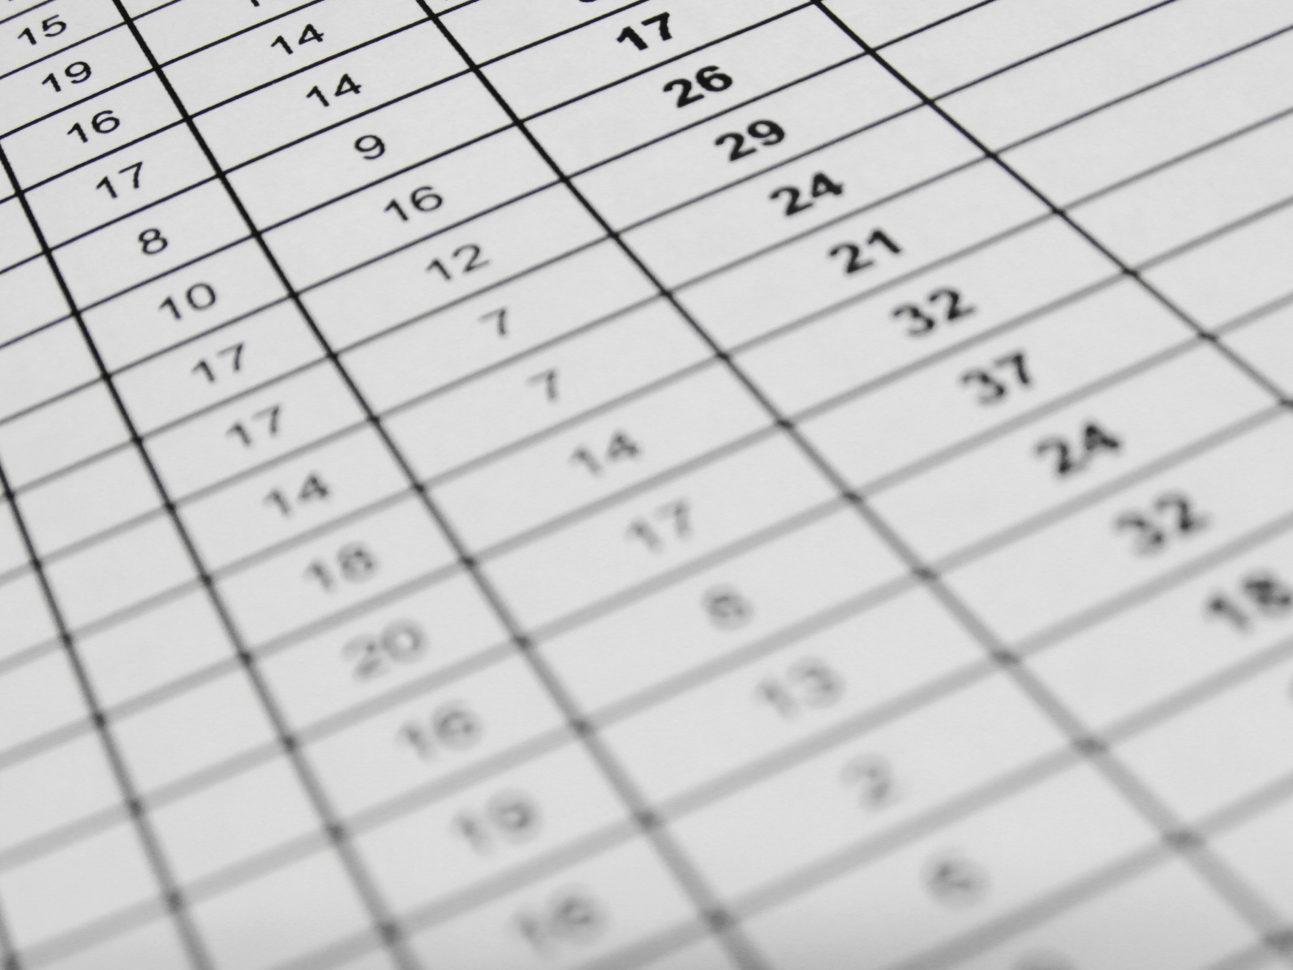 Diy Accounting Spreadsheets Spreadsheet Downloa Diy Accounting Spreadsheets